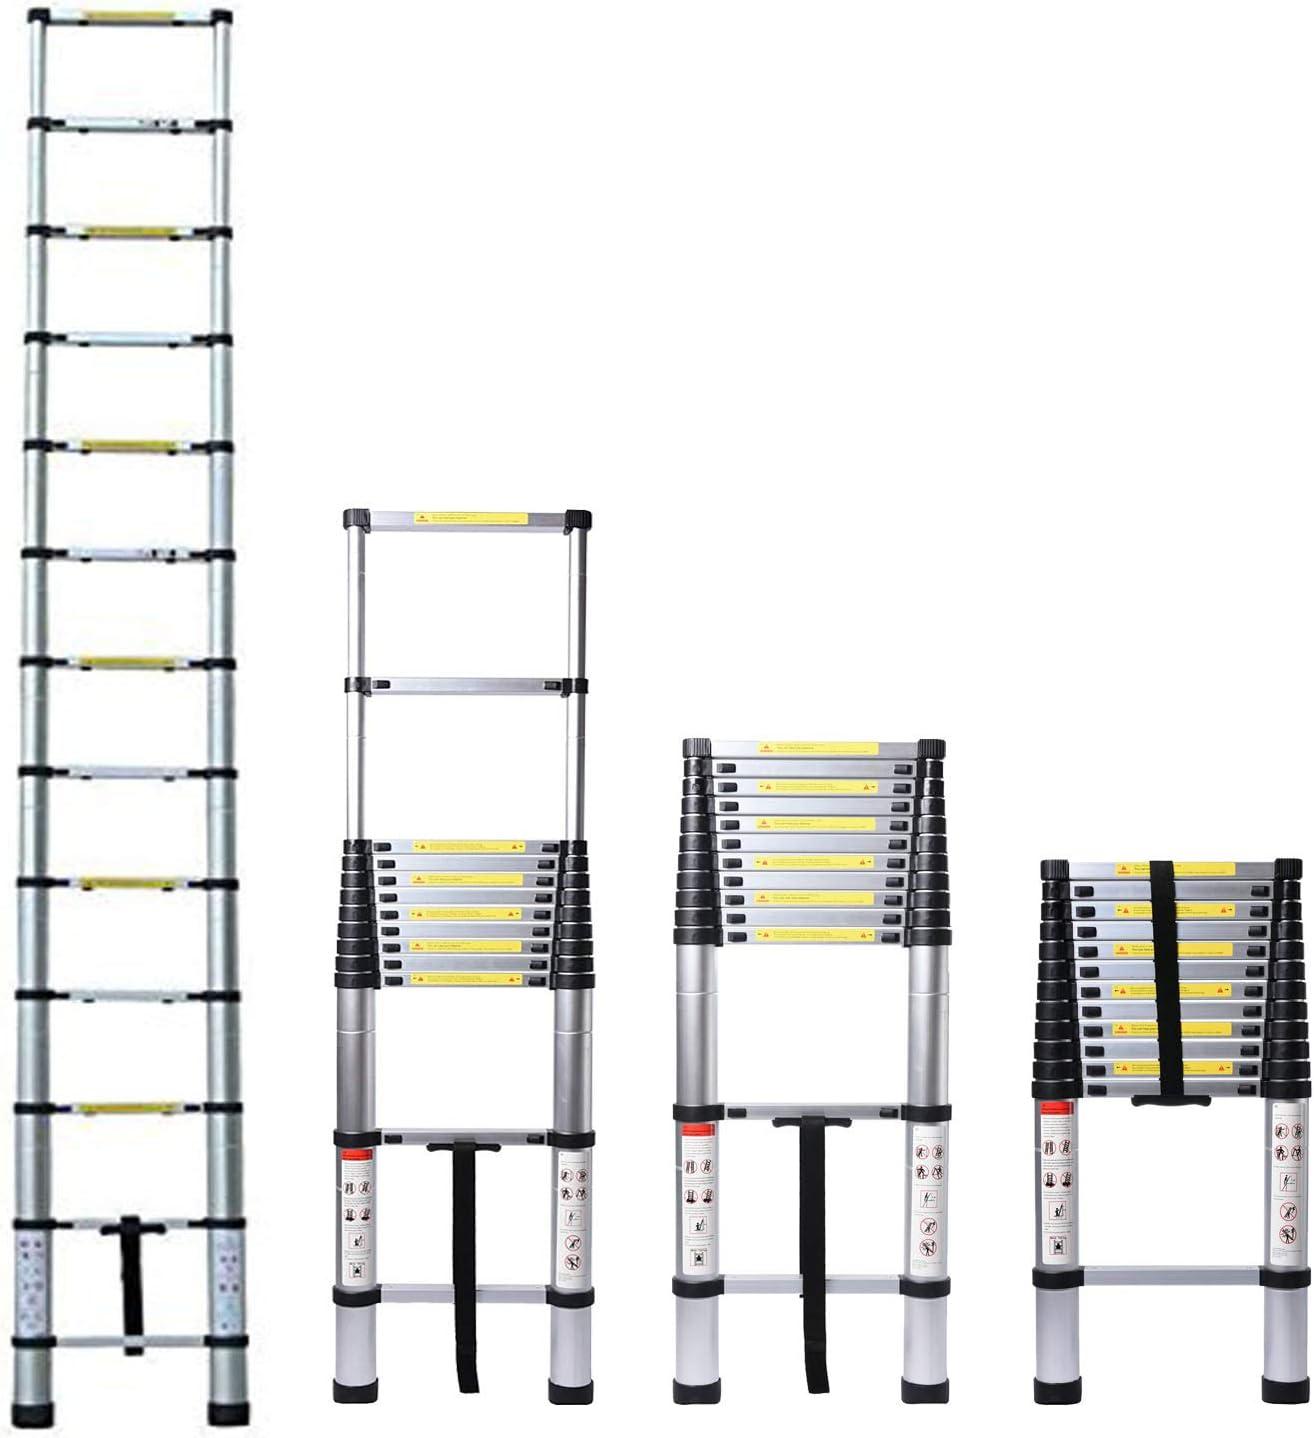 6.2M//20.35ft Aluminium Extension Telescopic Ladder Multi-Purpose Foldable Ladders and Roof Hook Portable Space-Saving EN 131 Certificate Max Load 150kg//330lb for Attic Loft